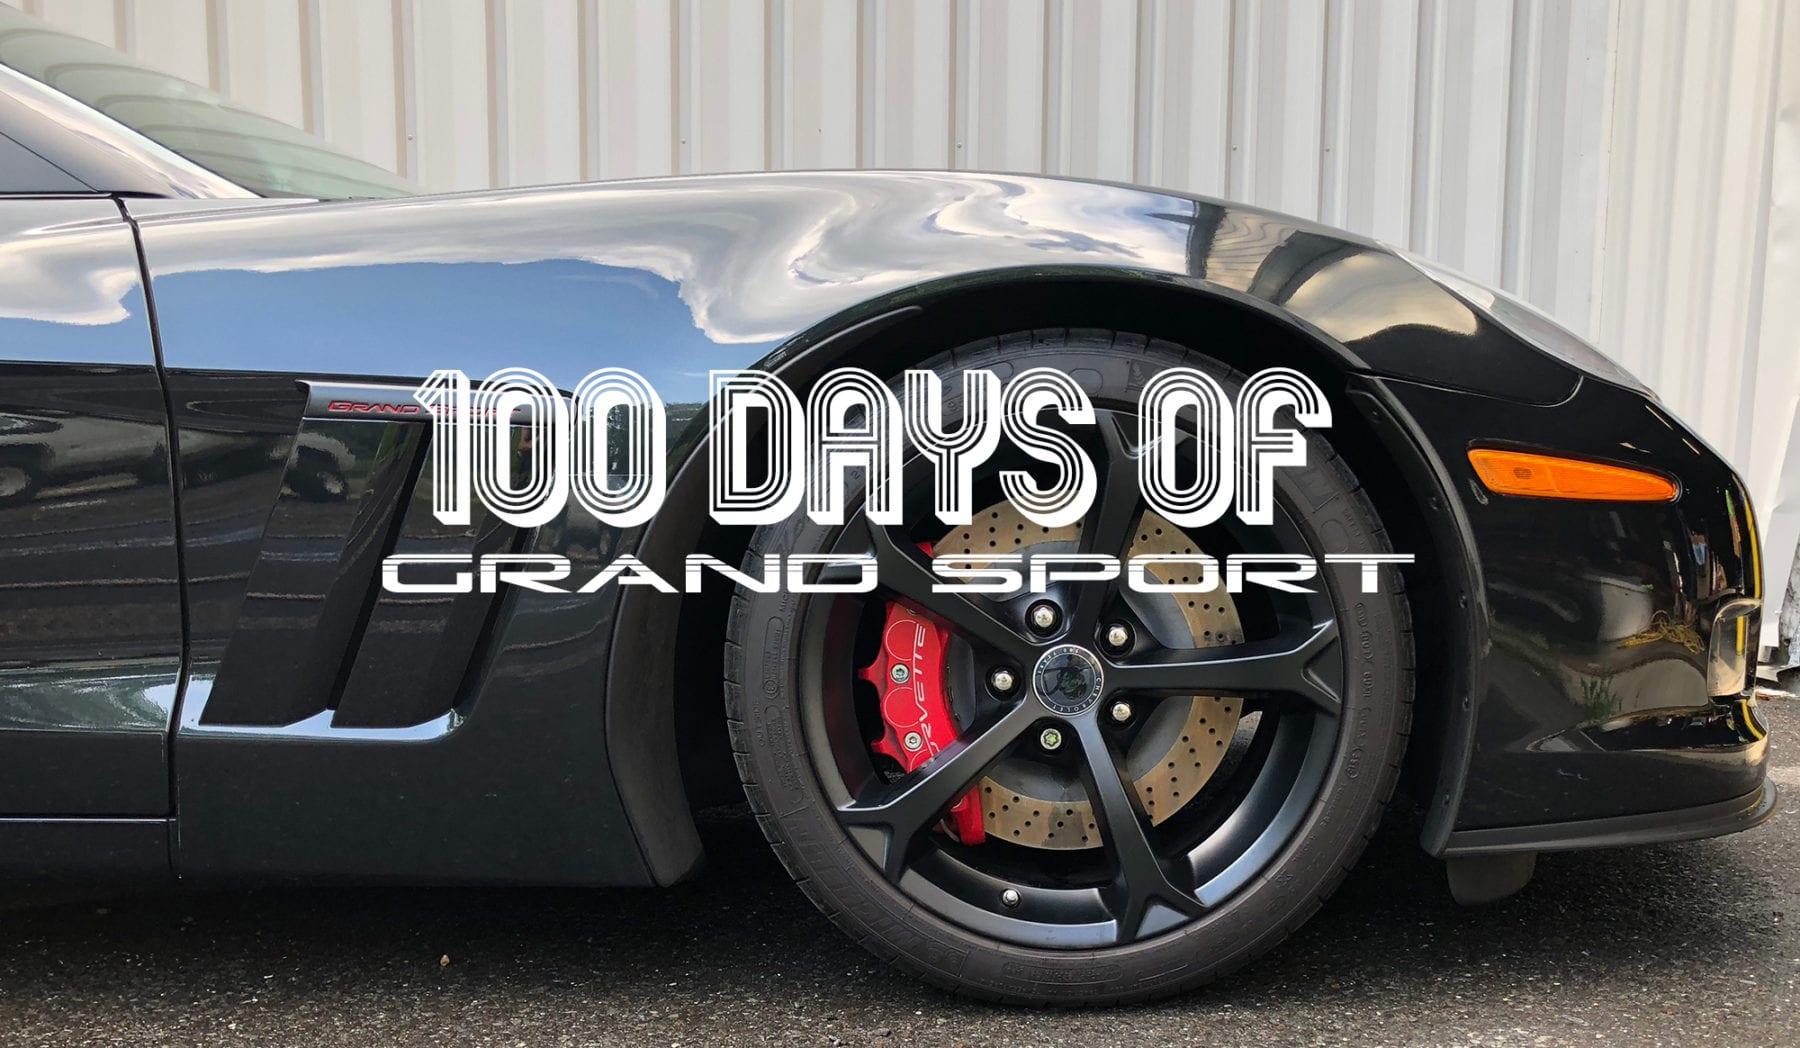 100-Days-of-Grand-Sport-pt3-lead